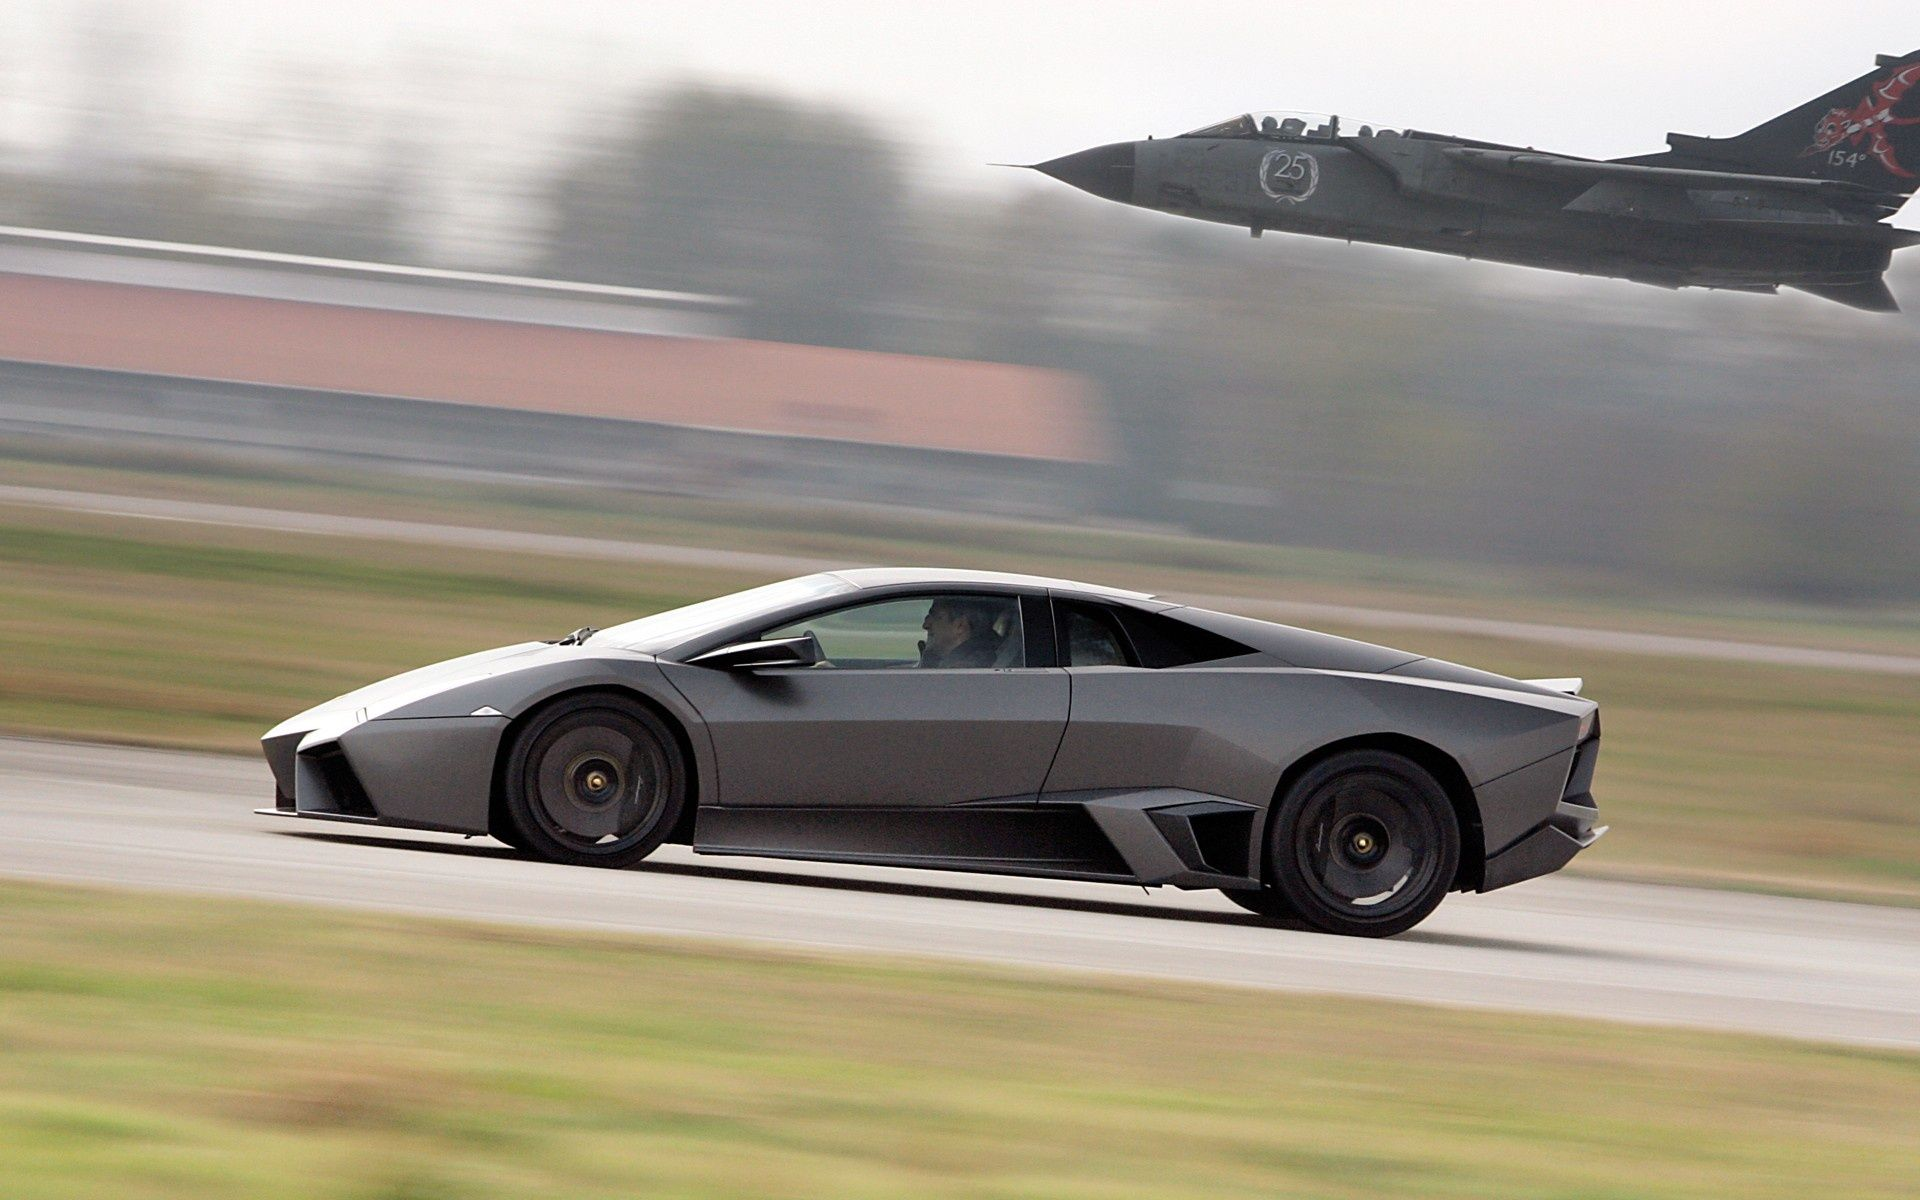 Lamborghini Tornado Reventon Google Images Lamborghini Reventón Lamborghini Cars Expensive Cars